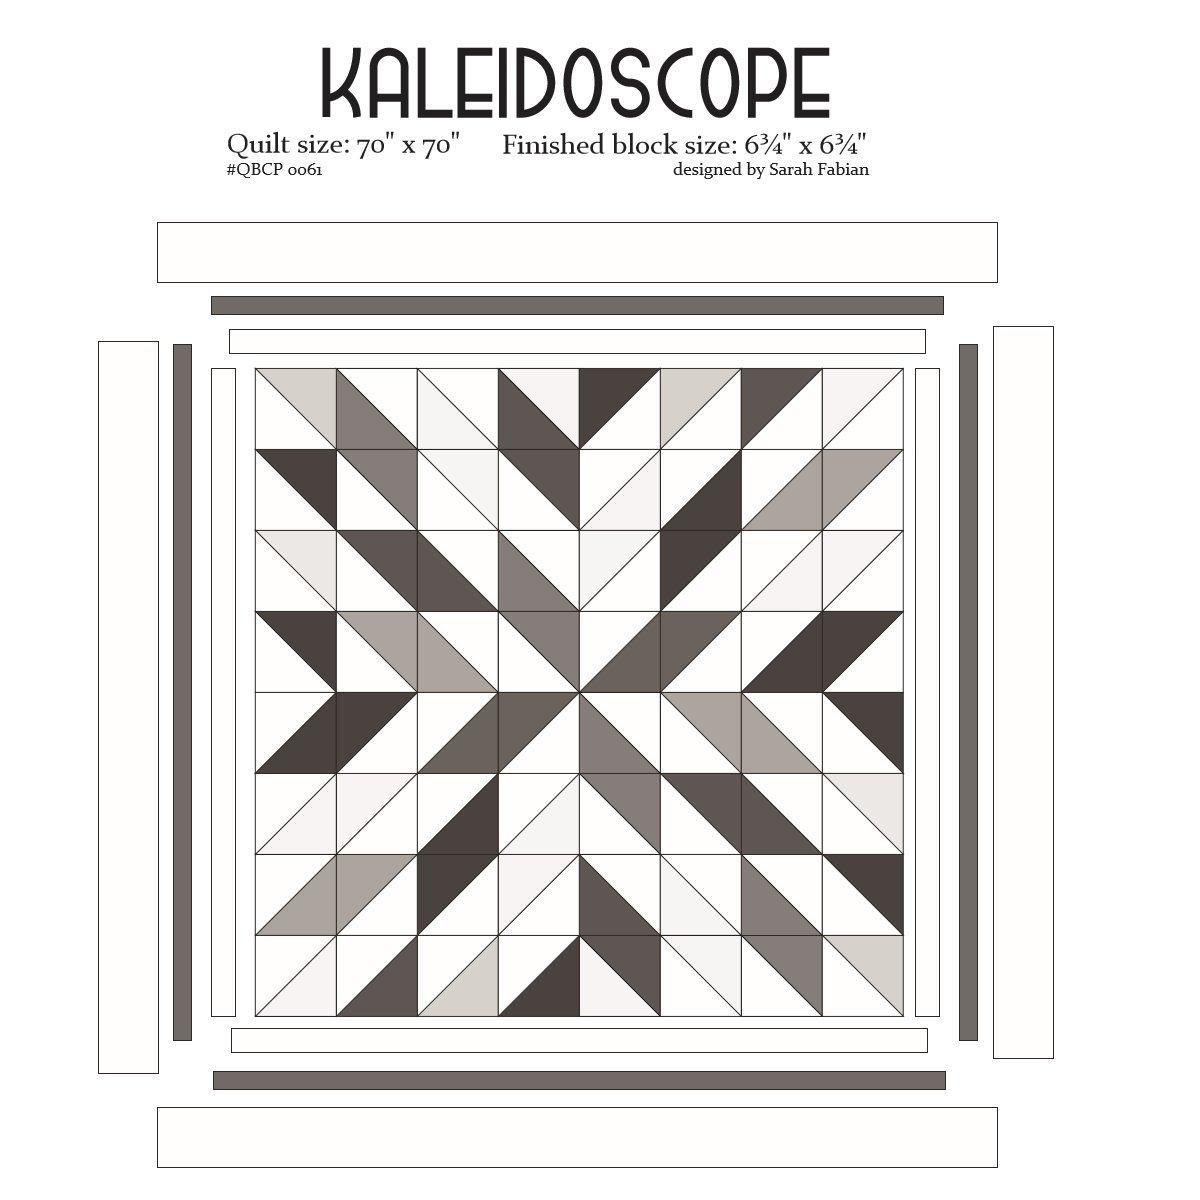 Cutie Pattern Kaleidoscope QBCP-0061